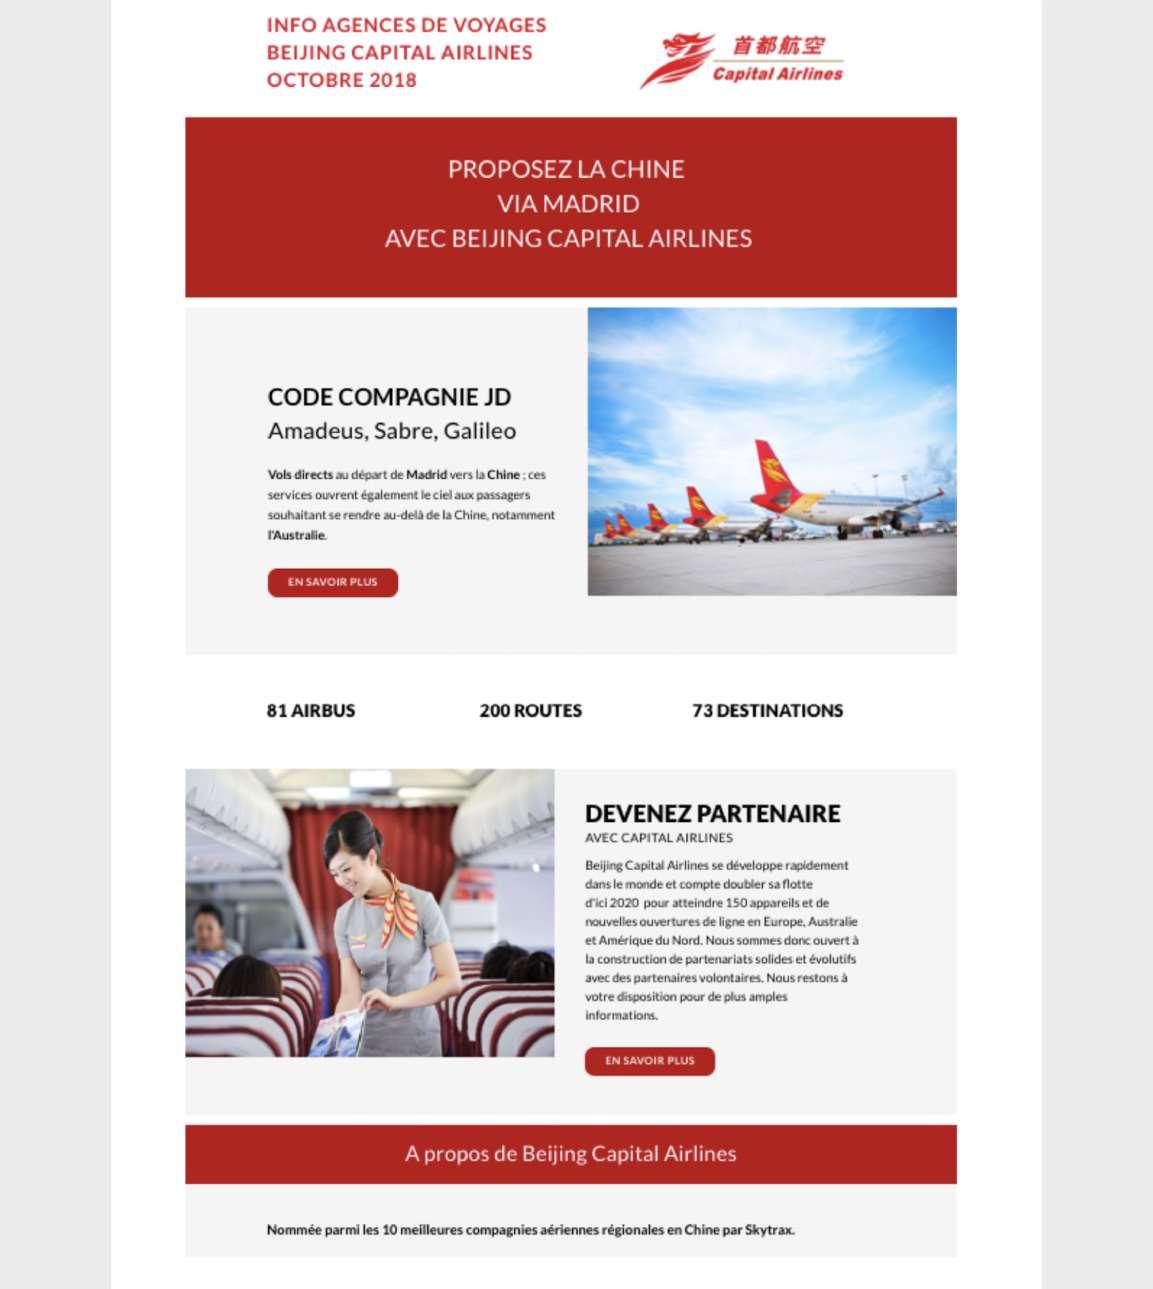 capital-airlines-web-zone-digital-zone-web-media